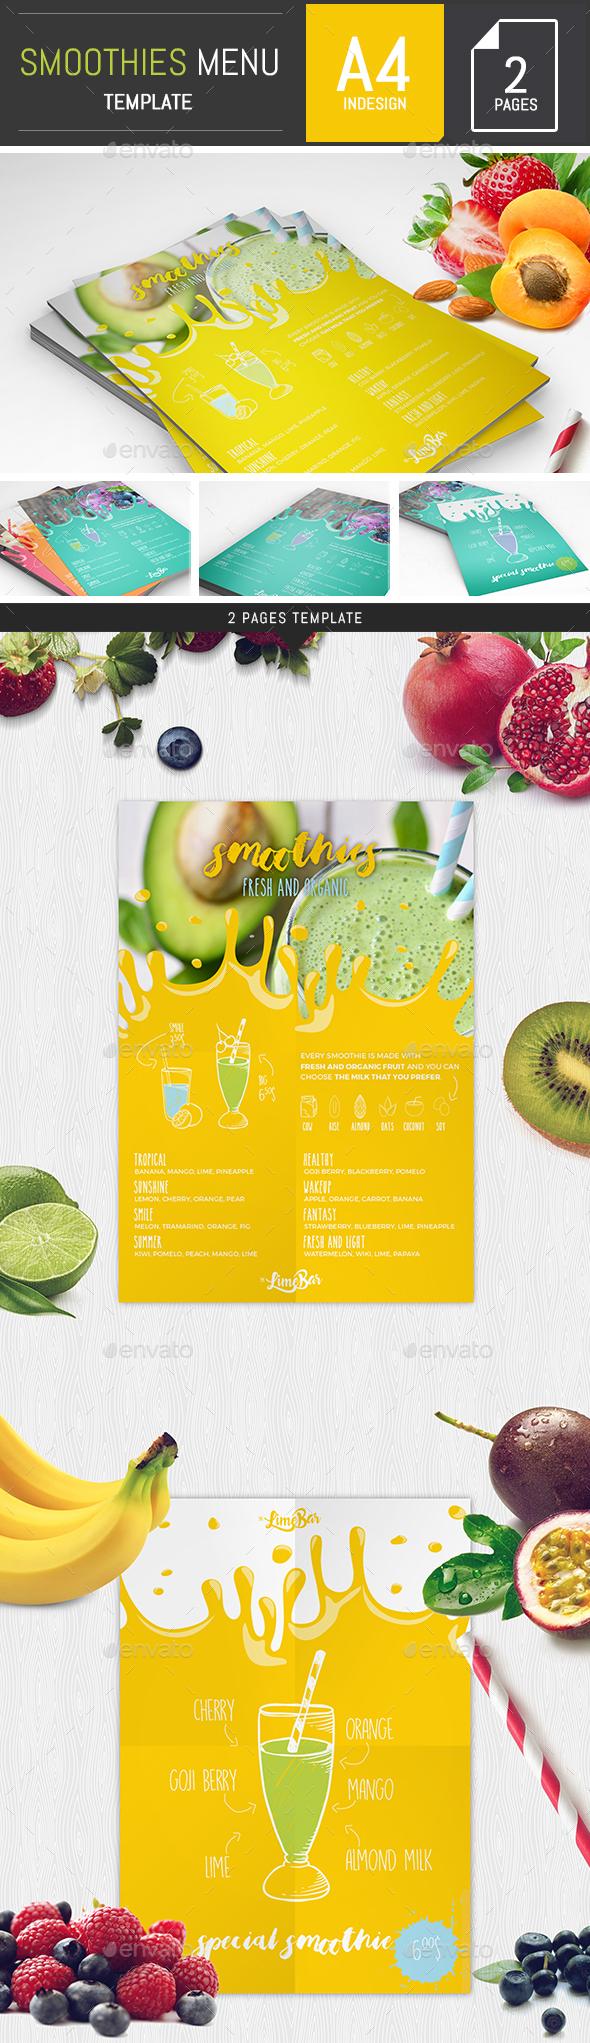 Smoothies Menu Template - Food Menus Print Templates